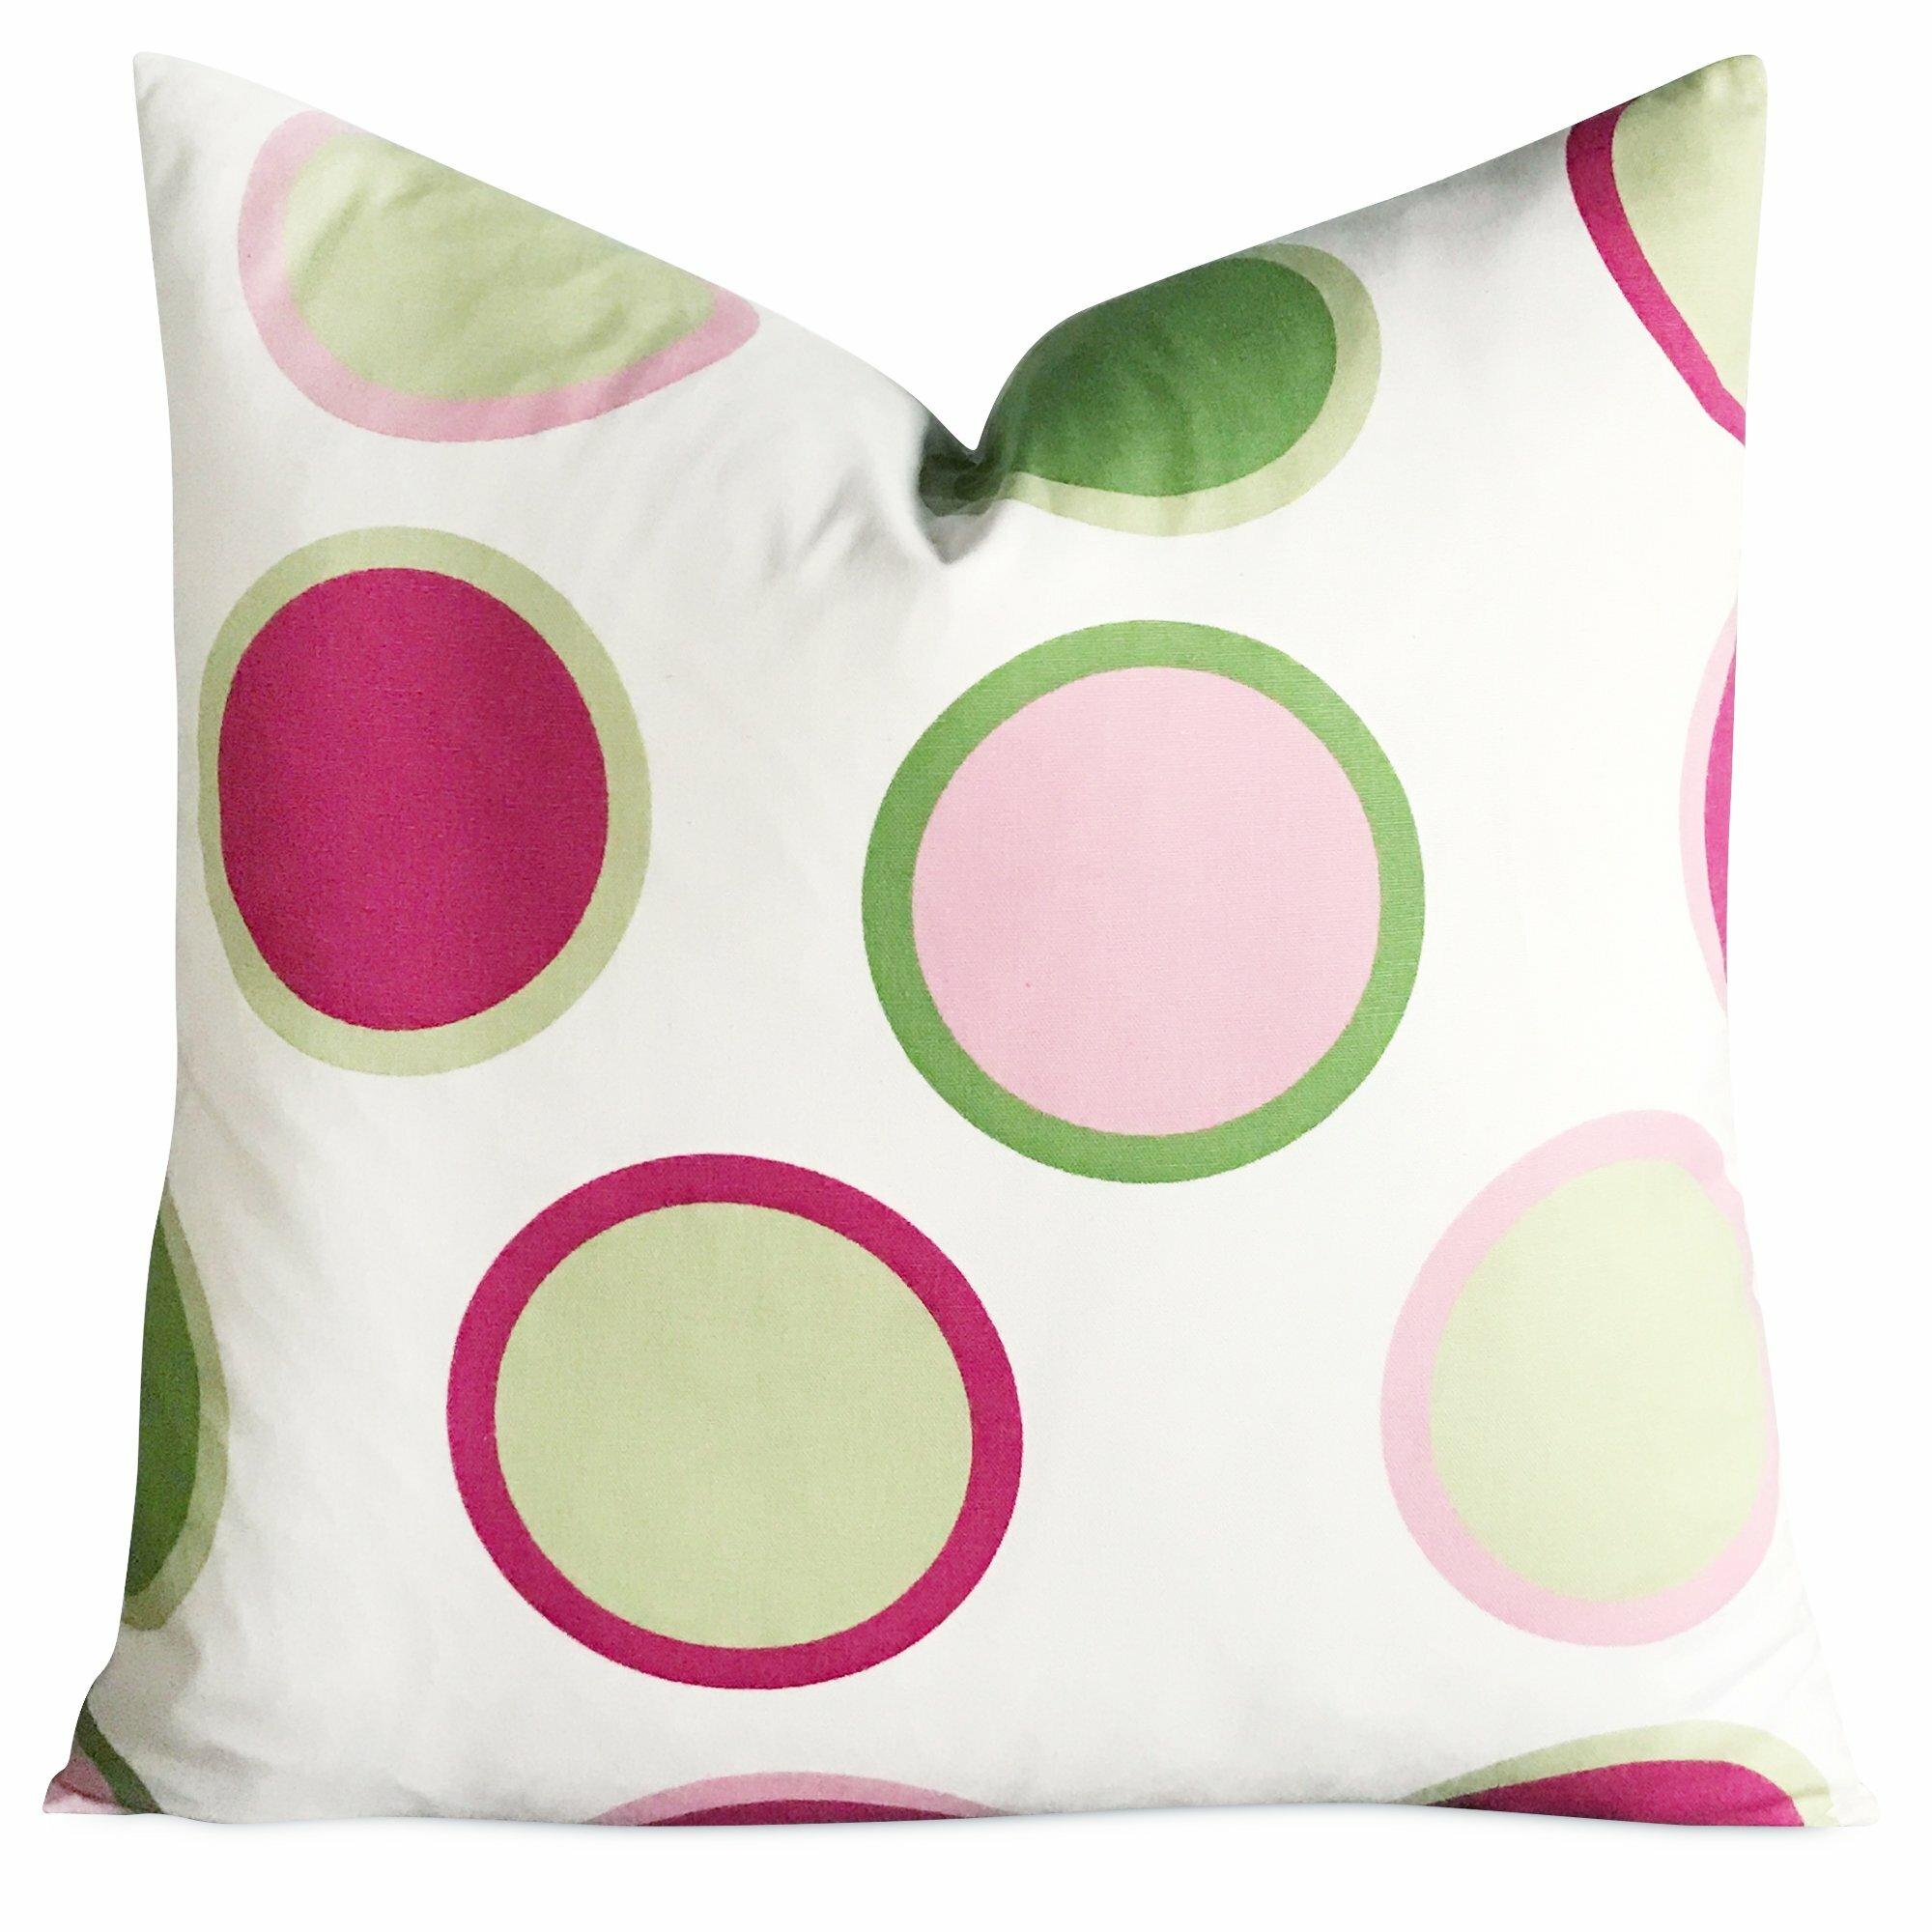 Ebern Designs East Broadway Large Polka Dot Decorative Pillow Cover Wayfair